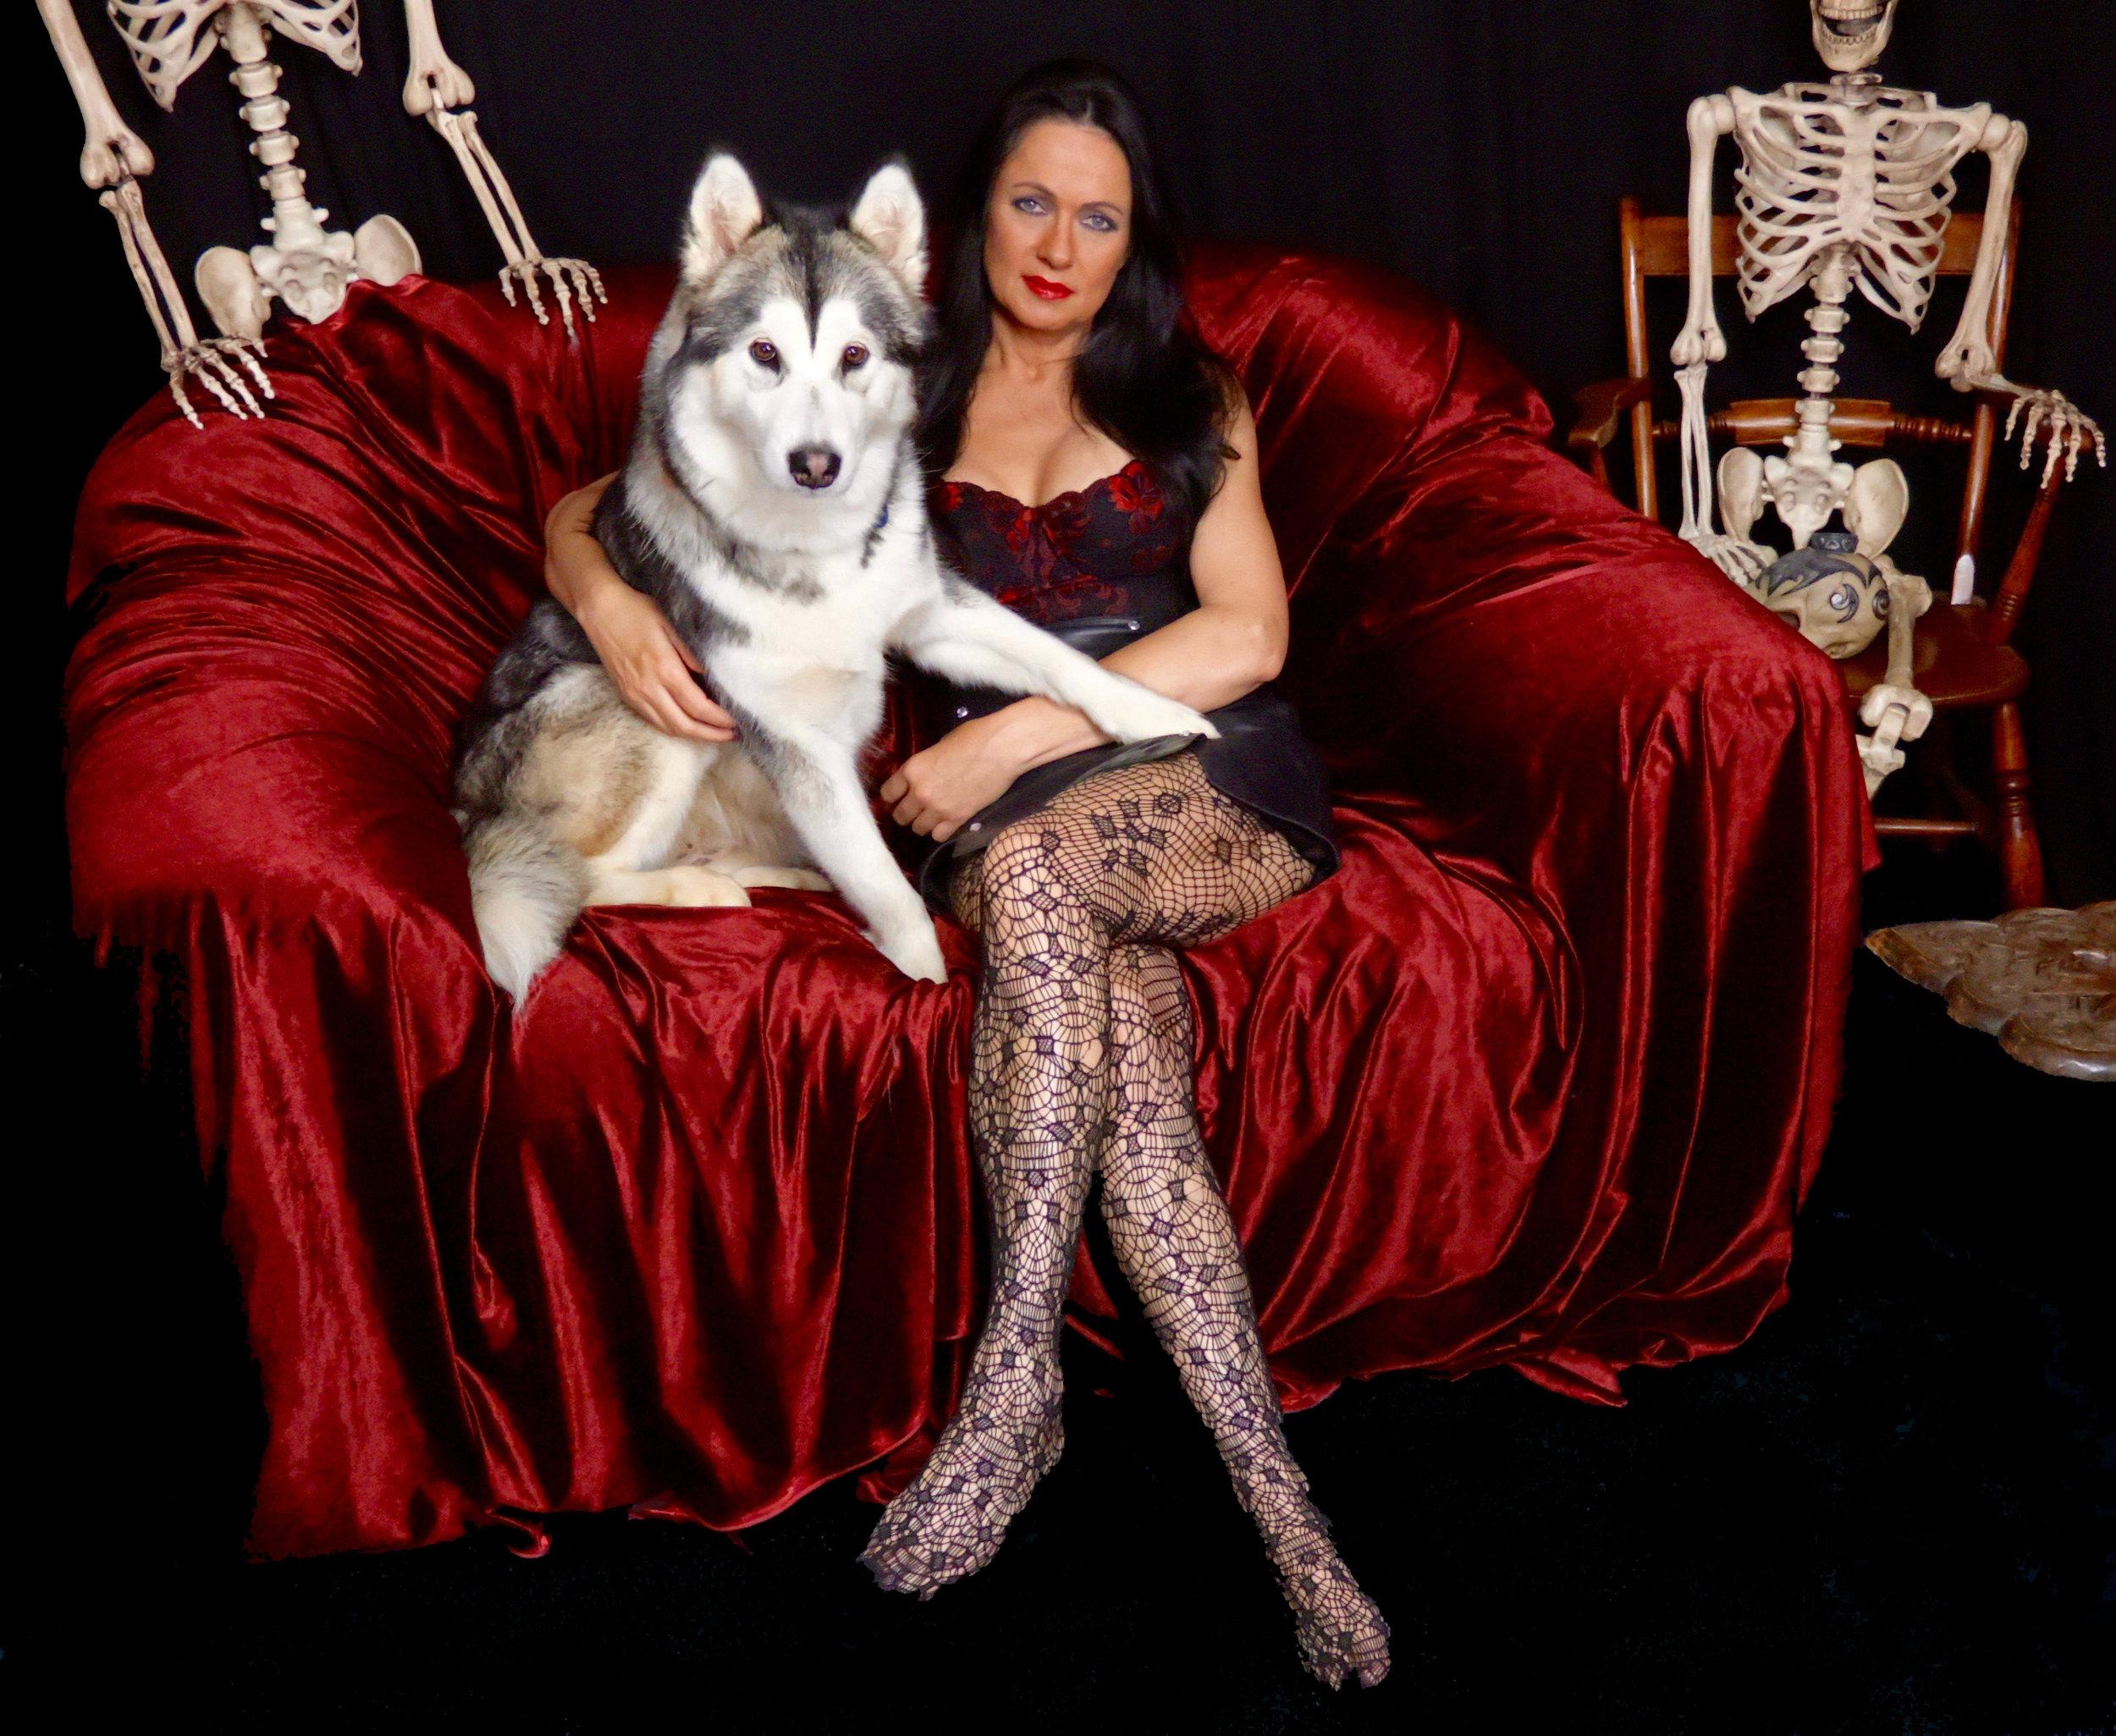 Judy Vamp-Shire and Vamplena